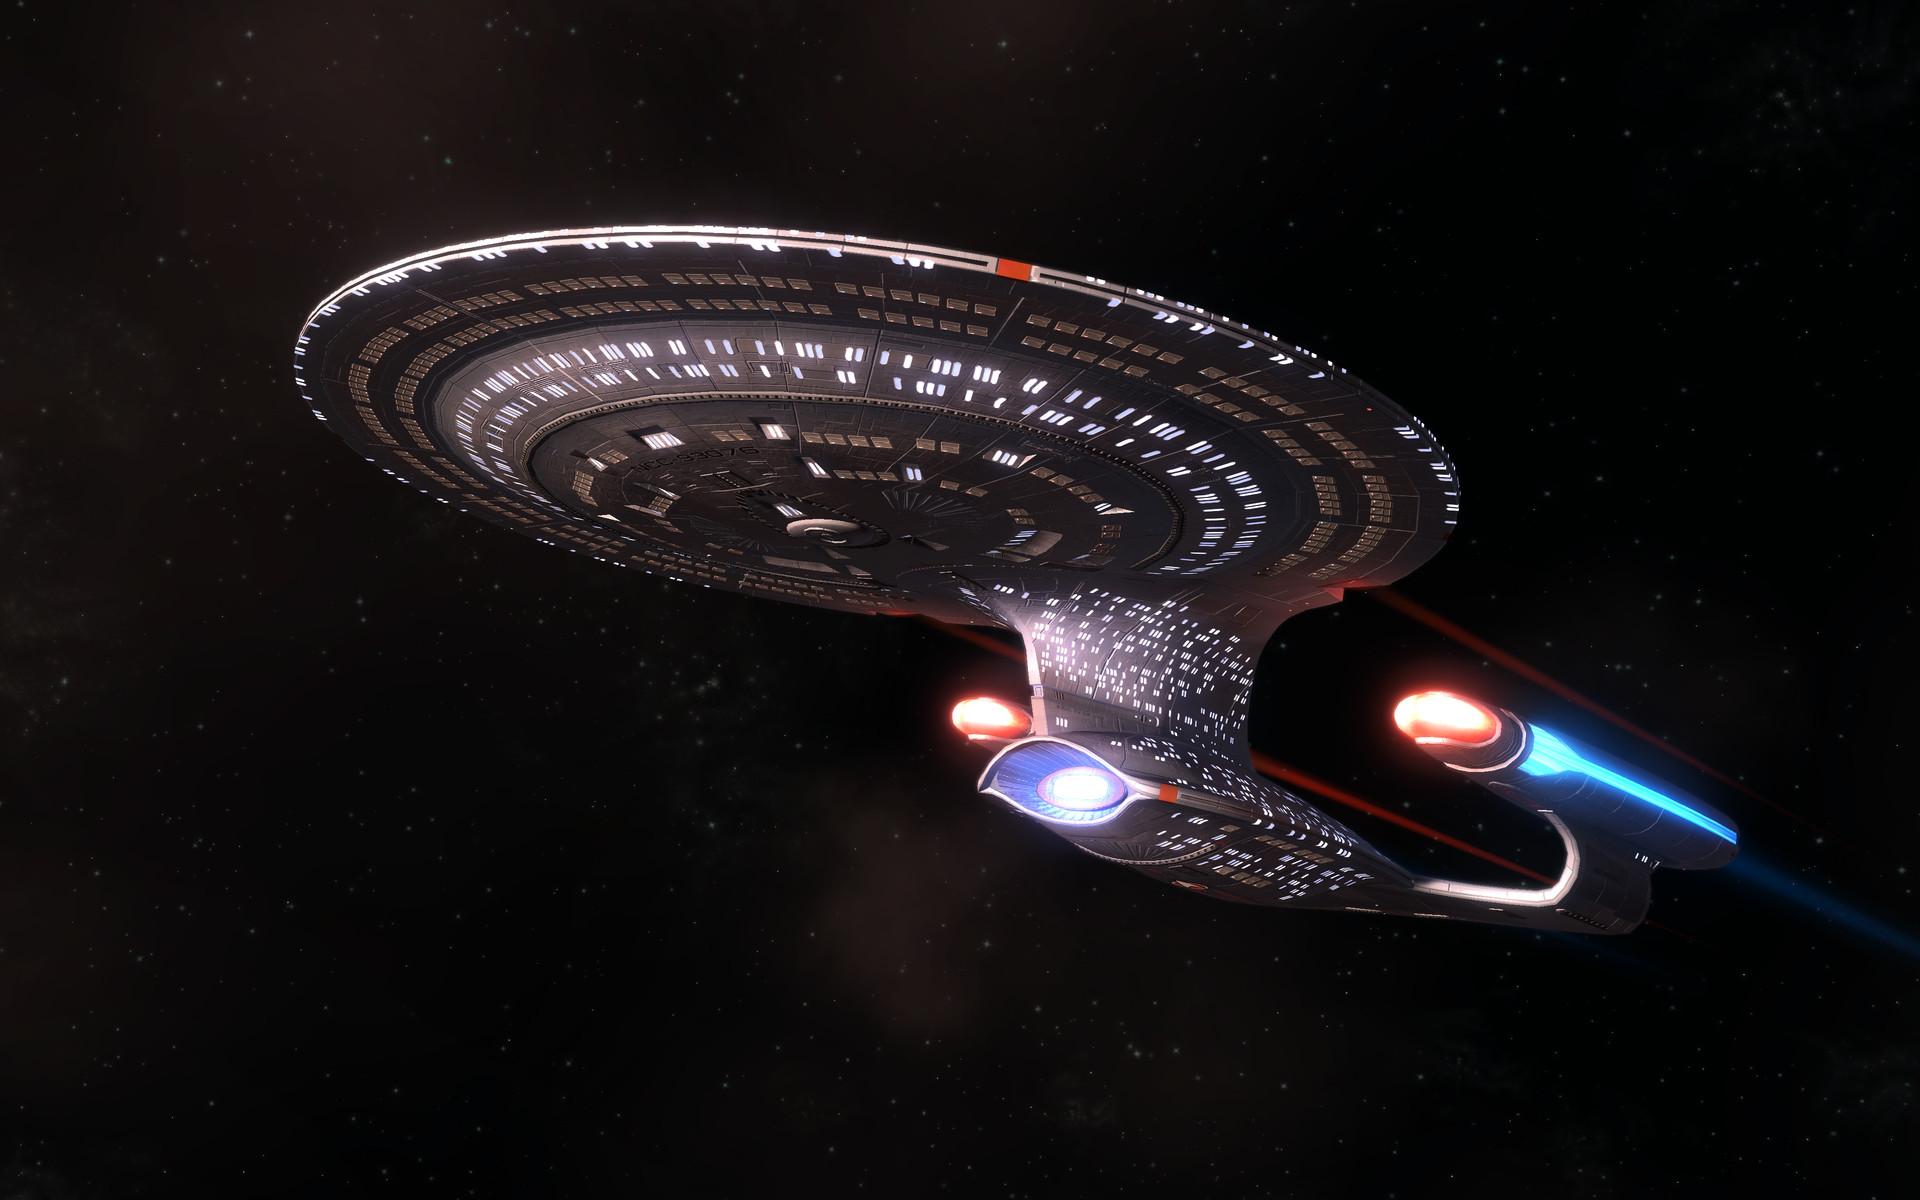 Thomas marrone ship fed fc3 type1 screenshot